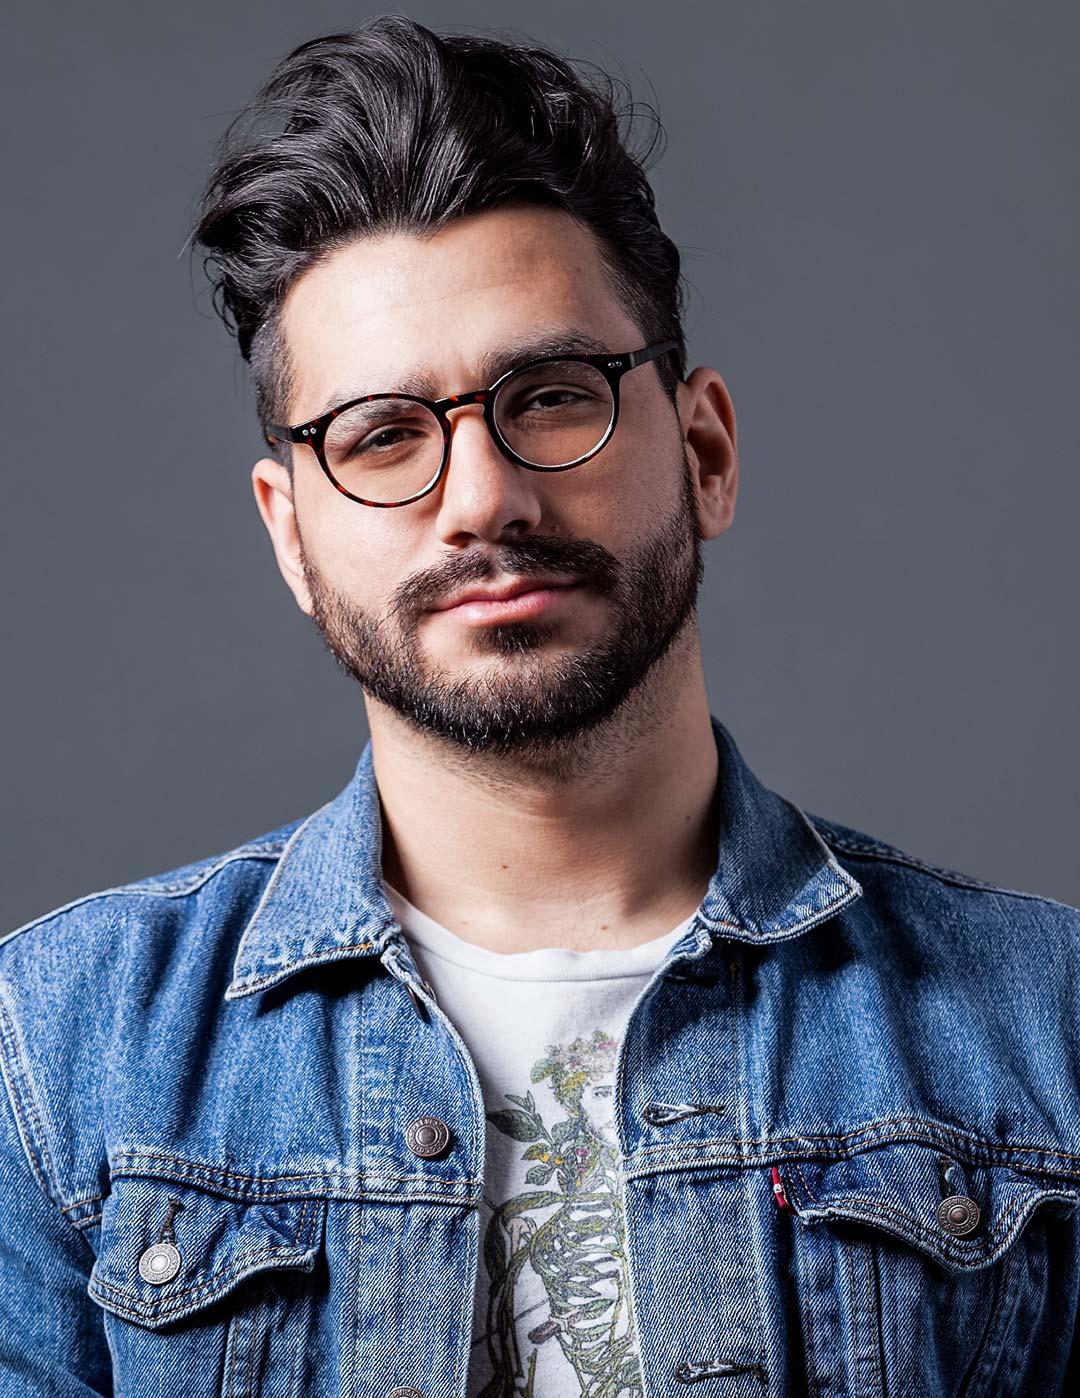 Dating profile portrait for Mark of Wichita, Ks